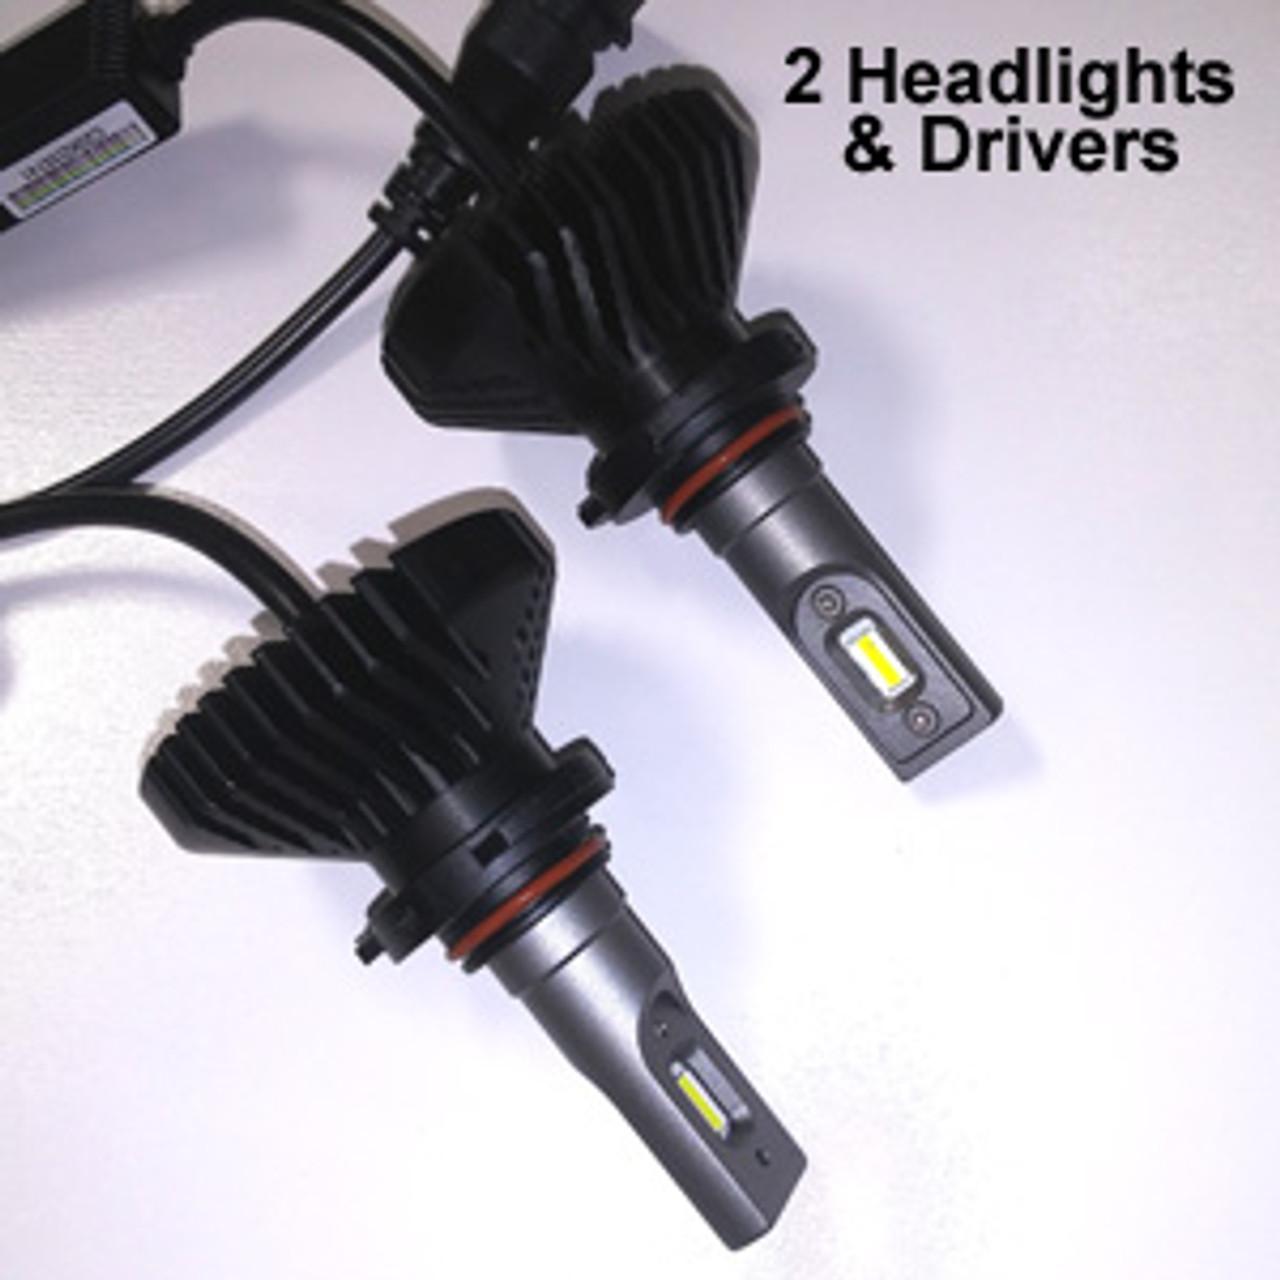 HEADLIGHTS-9005-V6s Headlight Kit with 9005 (HB3) Bases